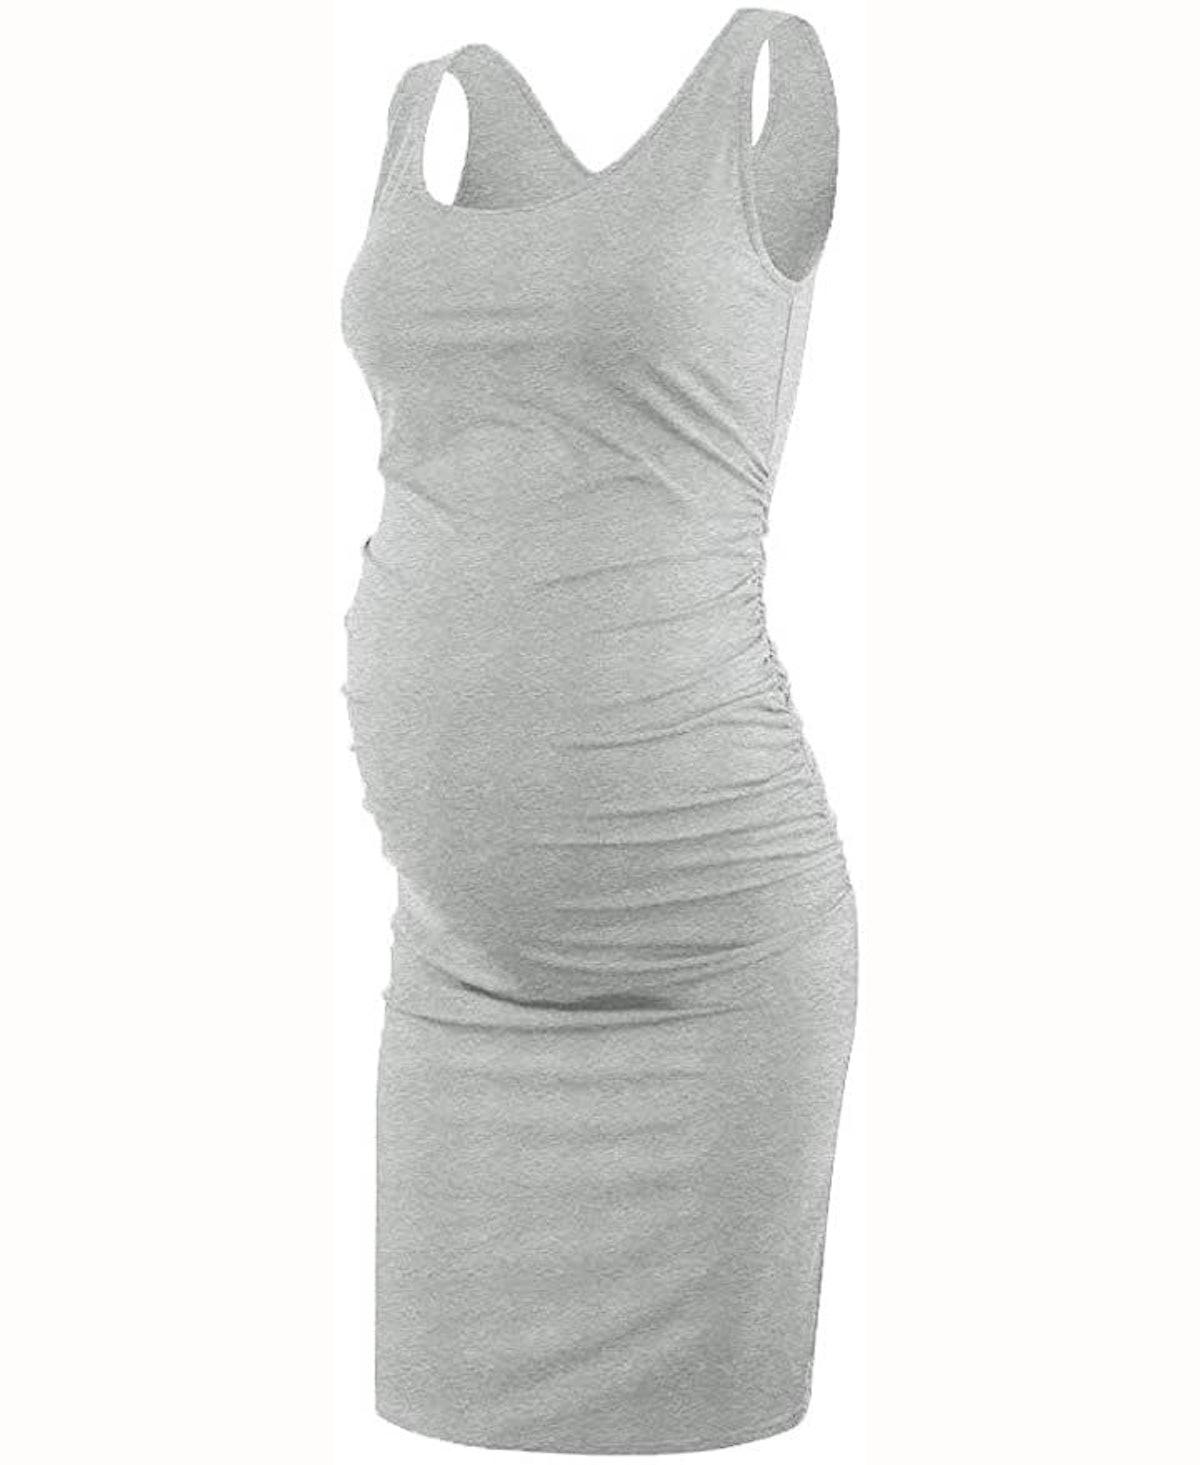 Liu & Qu Maternity Sleeveless Tank Dress